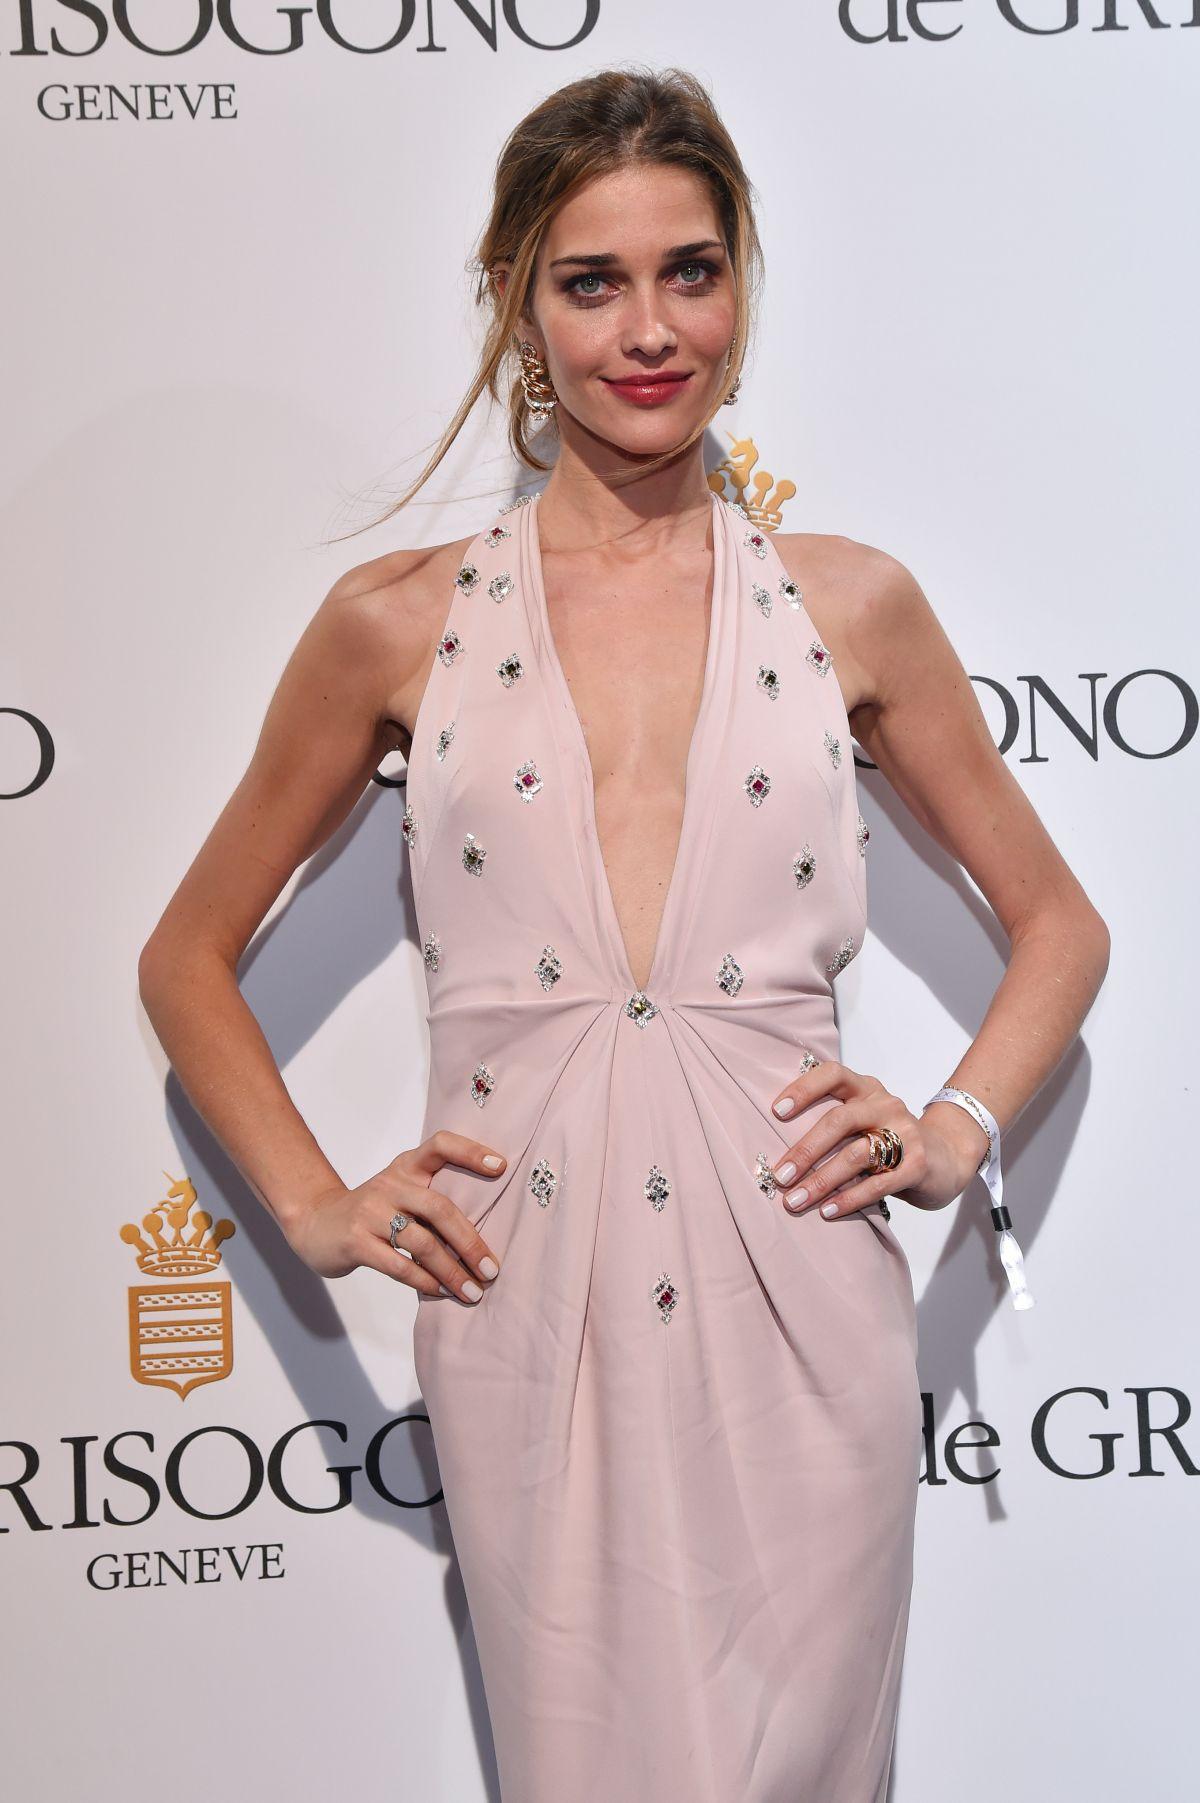 ANA BEATRIZ BARROS at De Grisogono Party at Cannes Film Festival 05/17/2016